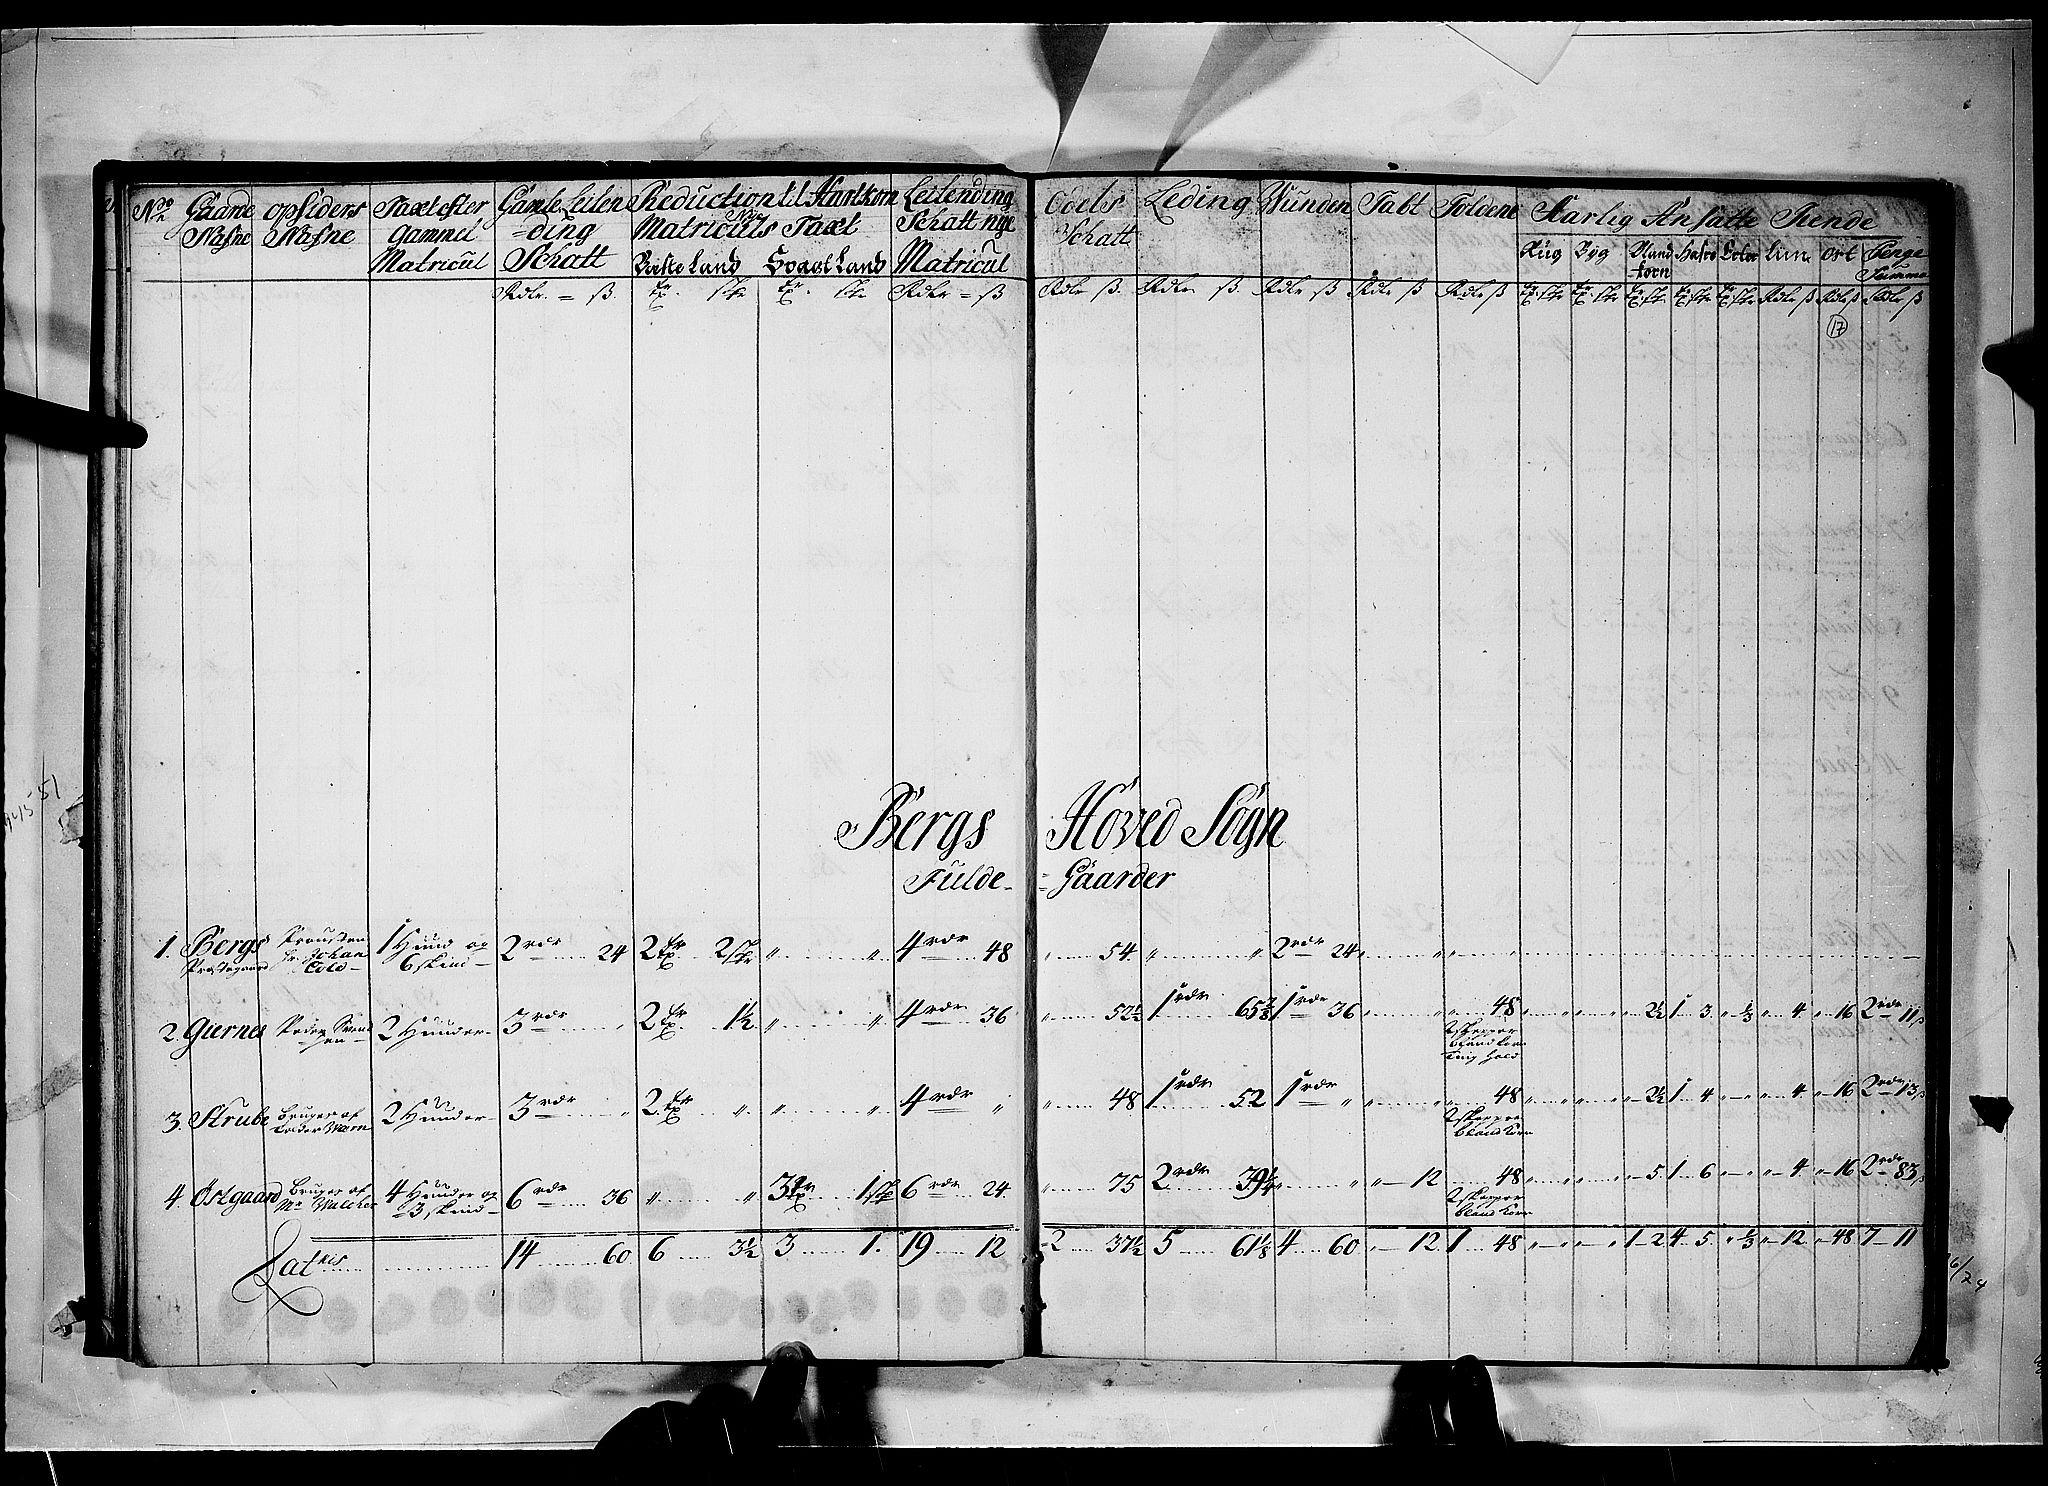 RA, Rentekammeret inntil 1814, Realistisk ordnet avdeling, N/Nb/Nbf/L0098: Idd og Marker matrikkelprotokoll, 1723, s. 16b-17a